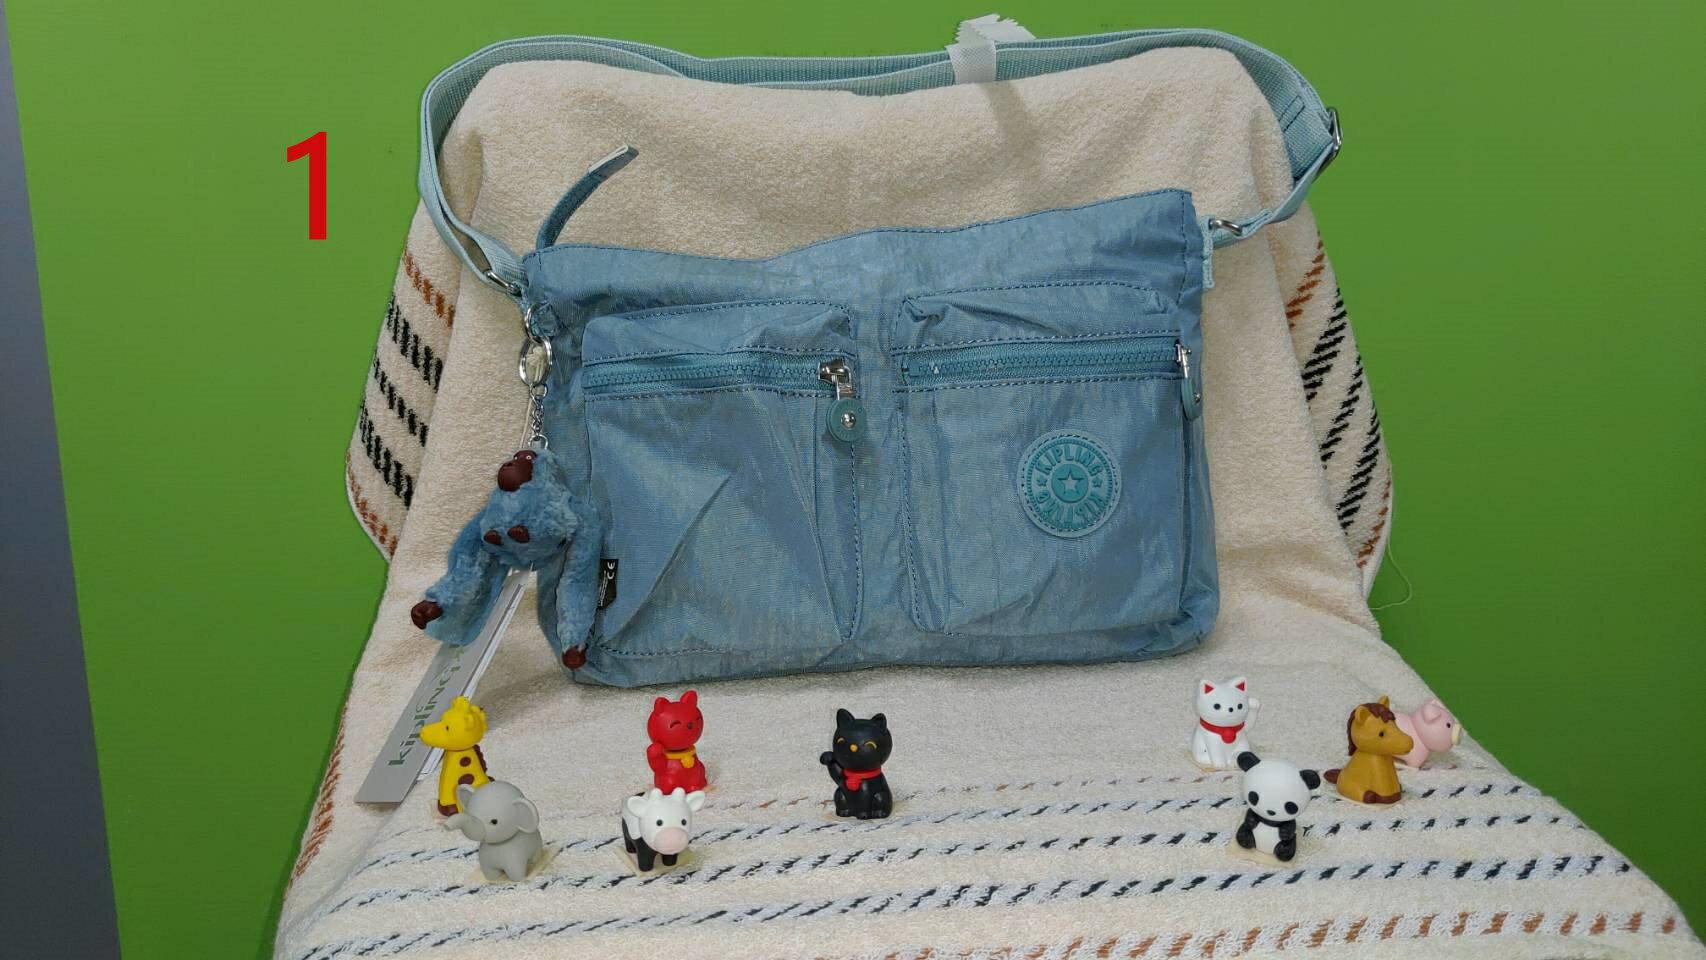 【iWork】Kipling 吉普林凱普林尼龍包 斜背包 側背包 後背包 防水 品質